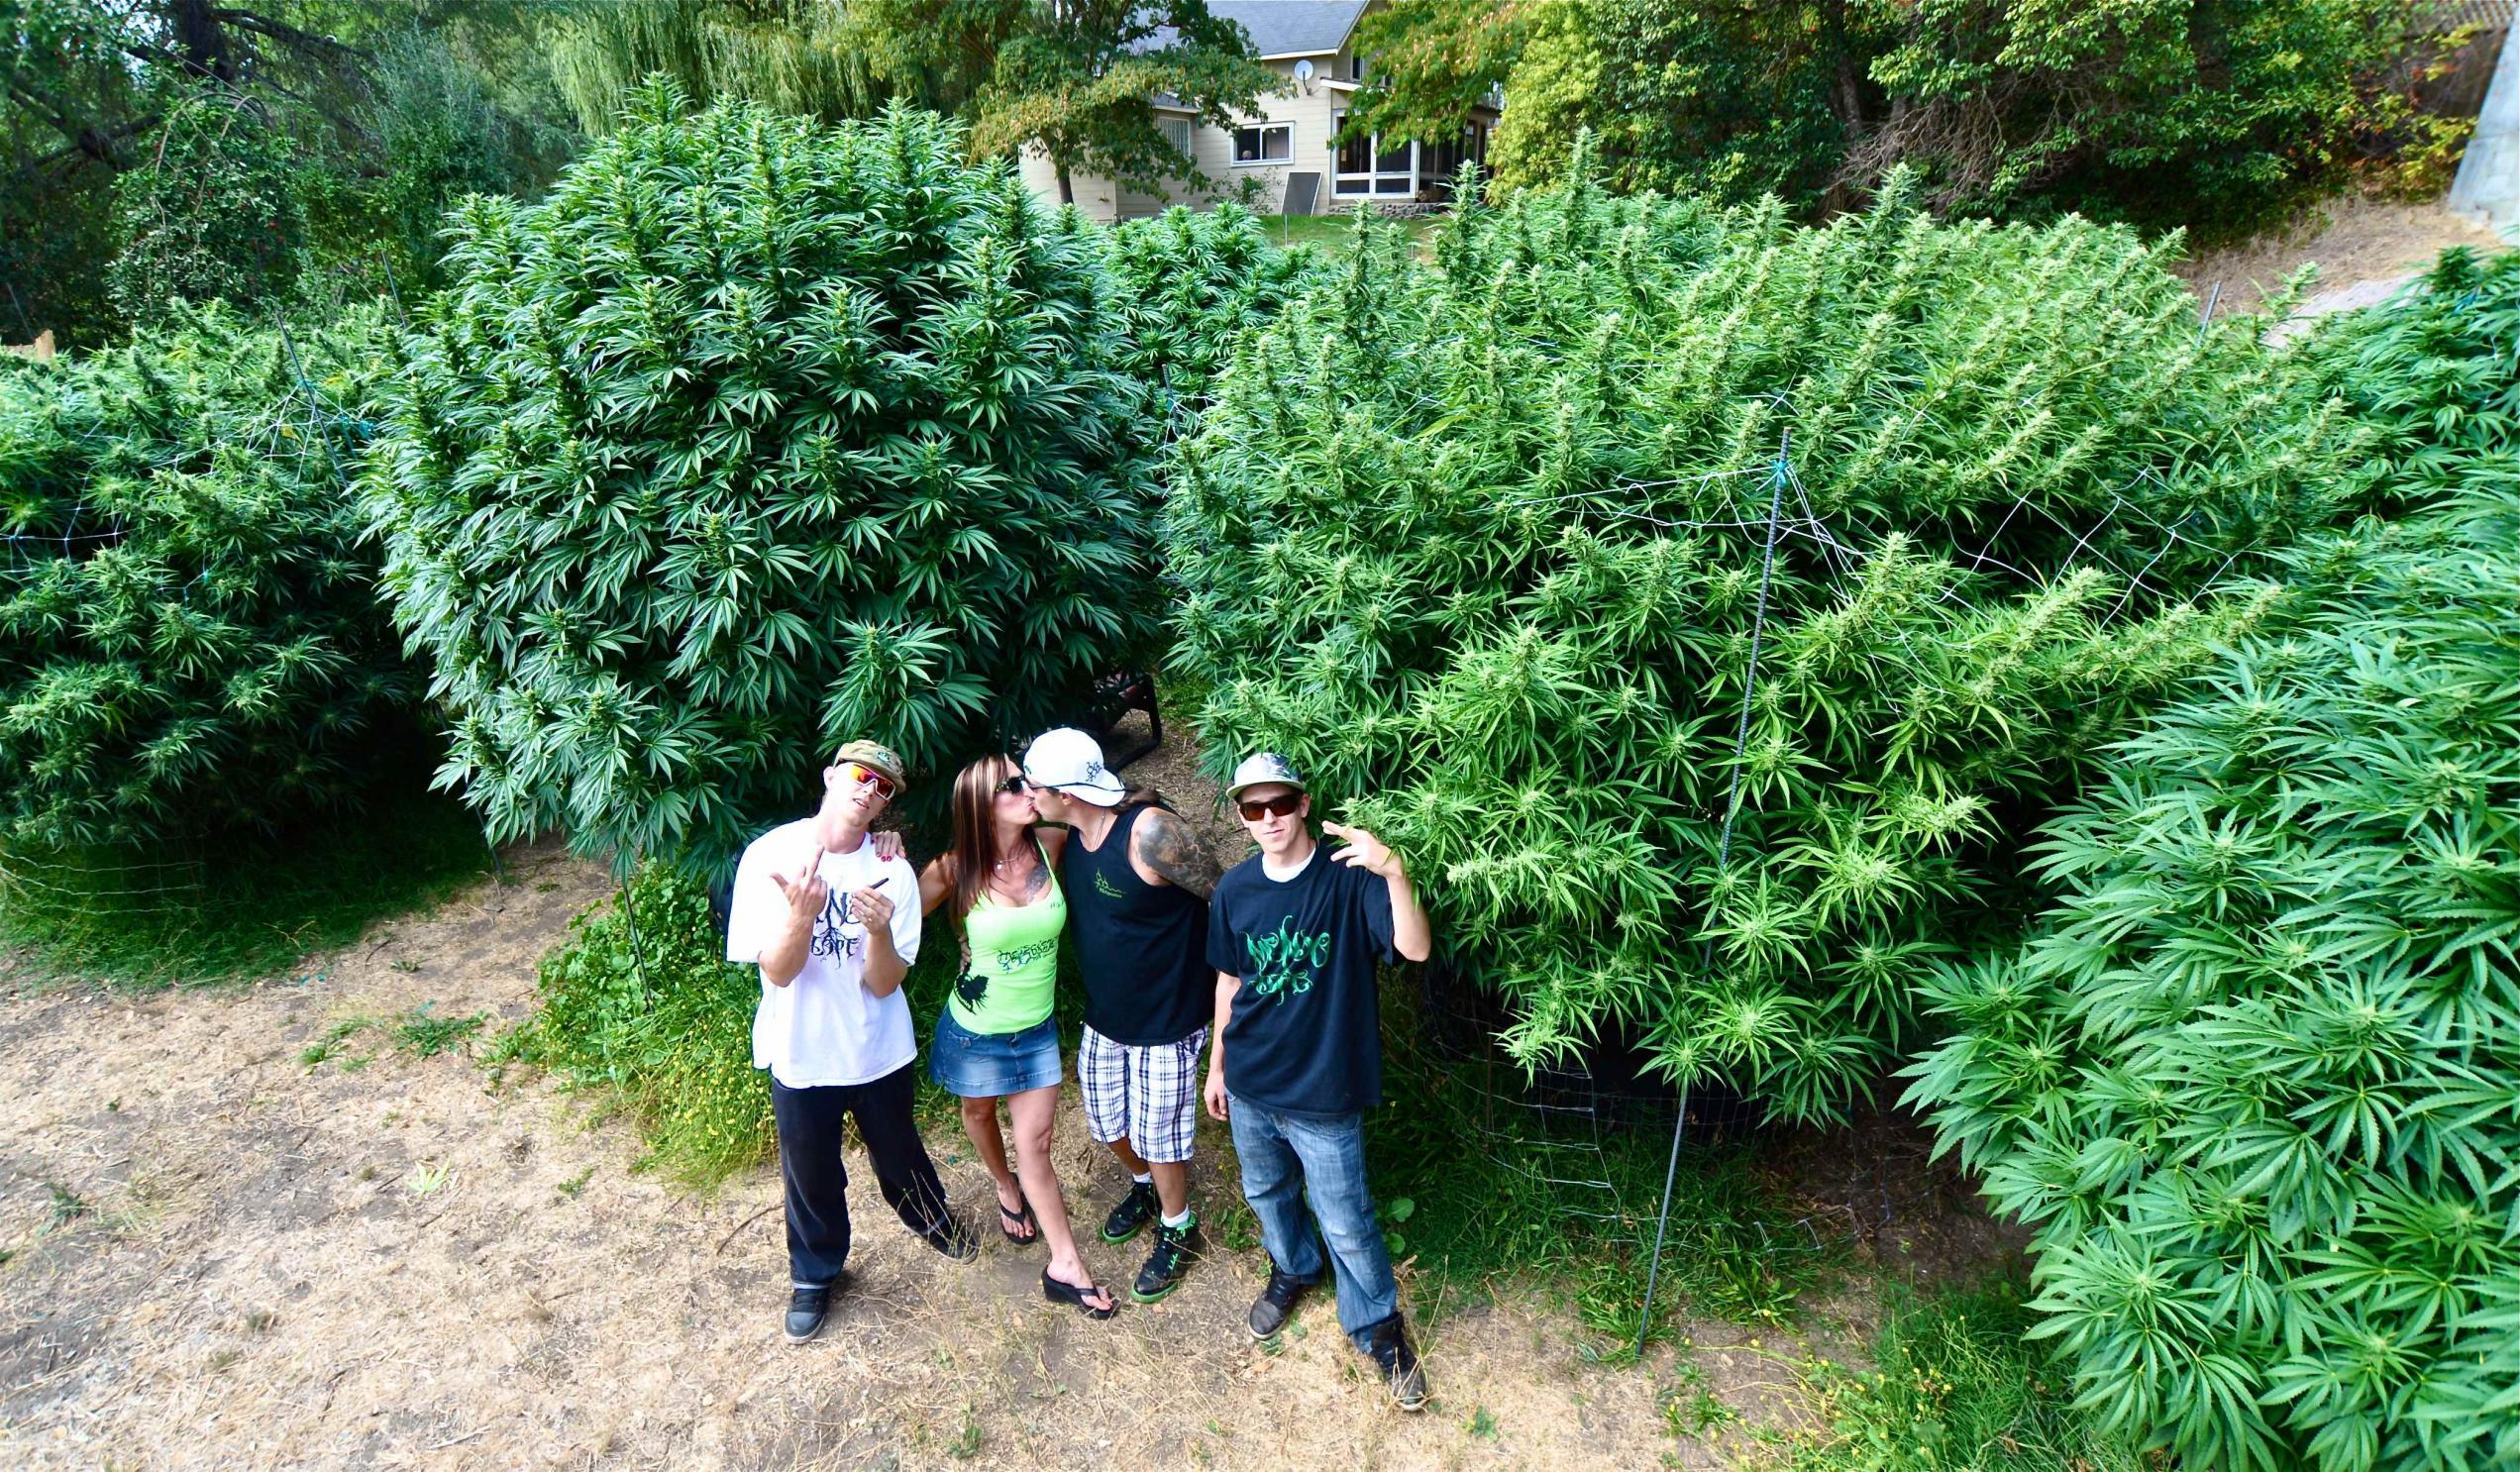 marijuana bushes